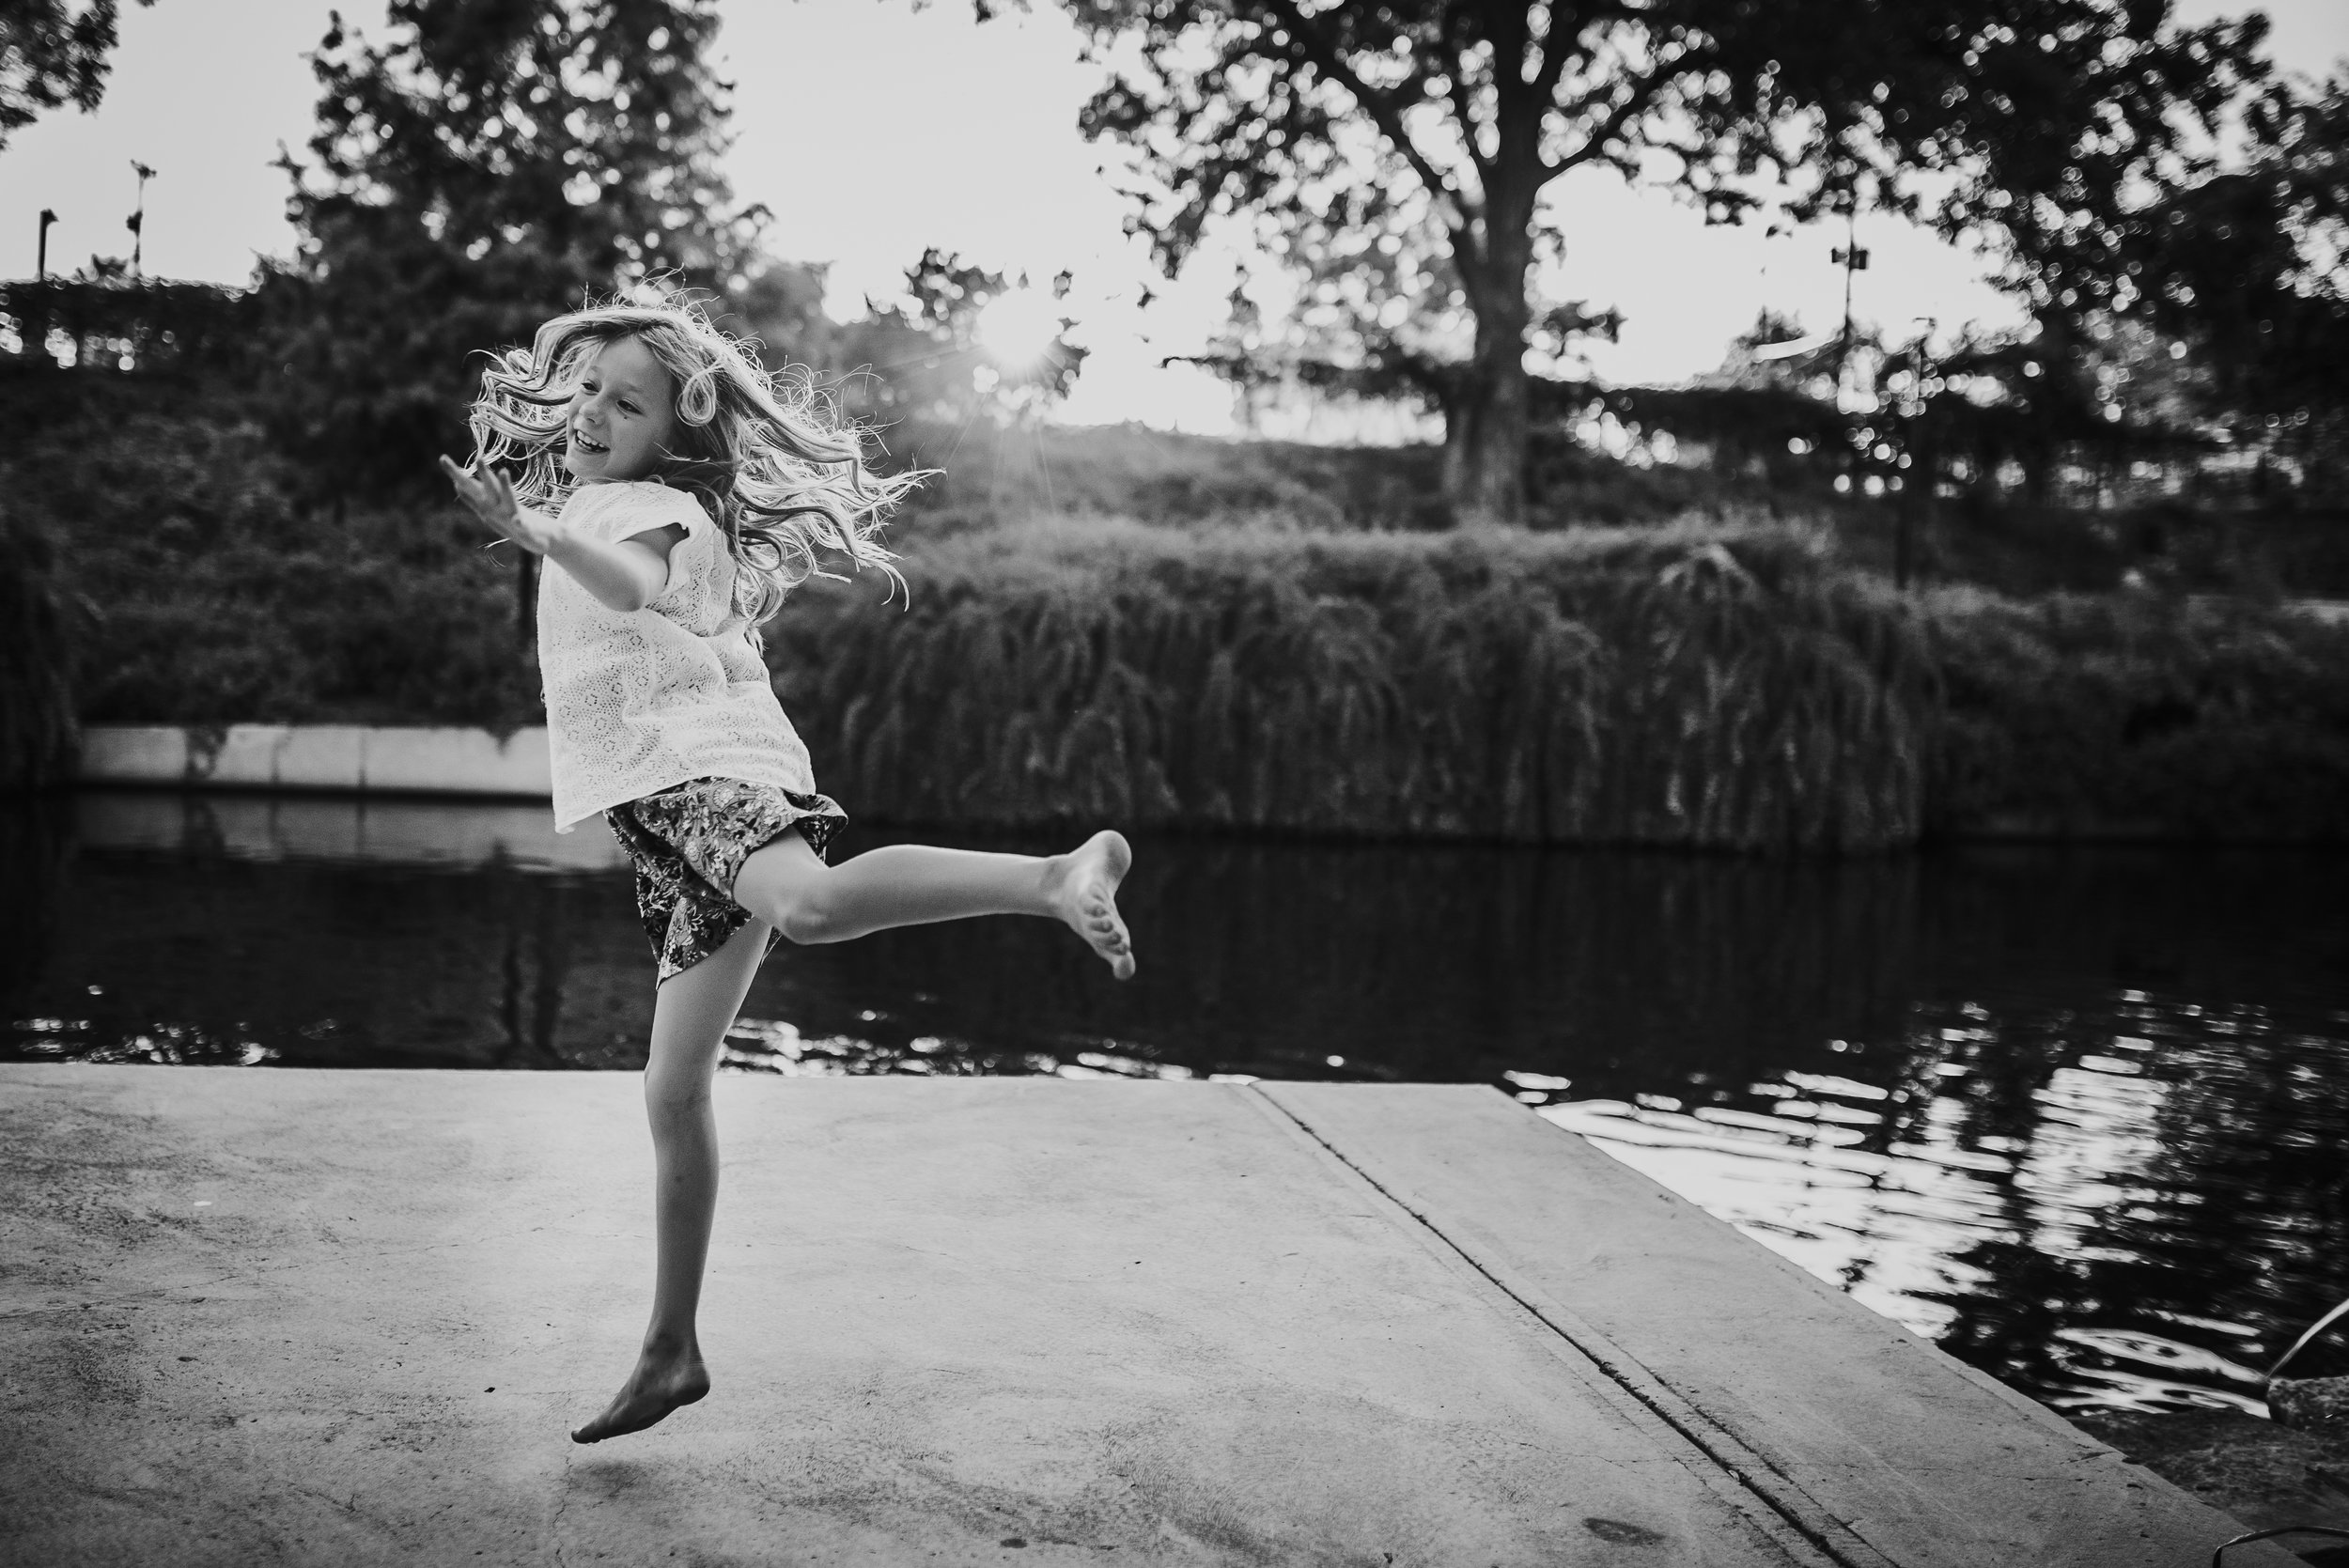 Abby Kennan Photography-San Antonio Family Photographer-The Pearl Photo Session-San Antonio Child Photographer-The Historic Pearl Brewery-Dance-BW.jpg